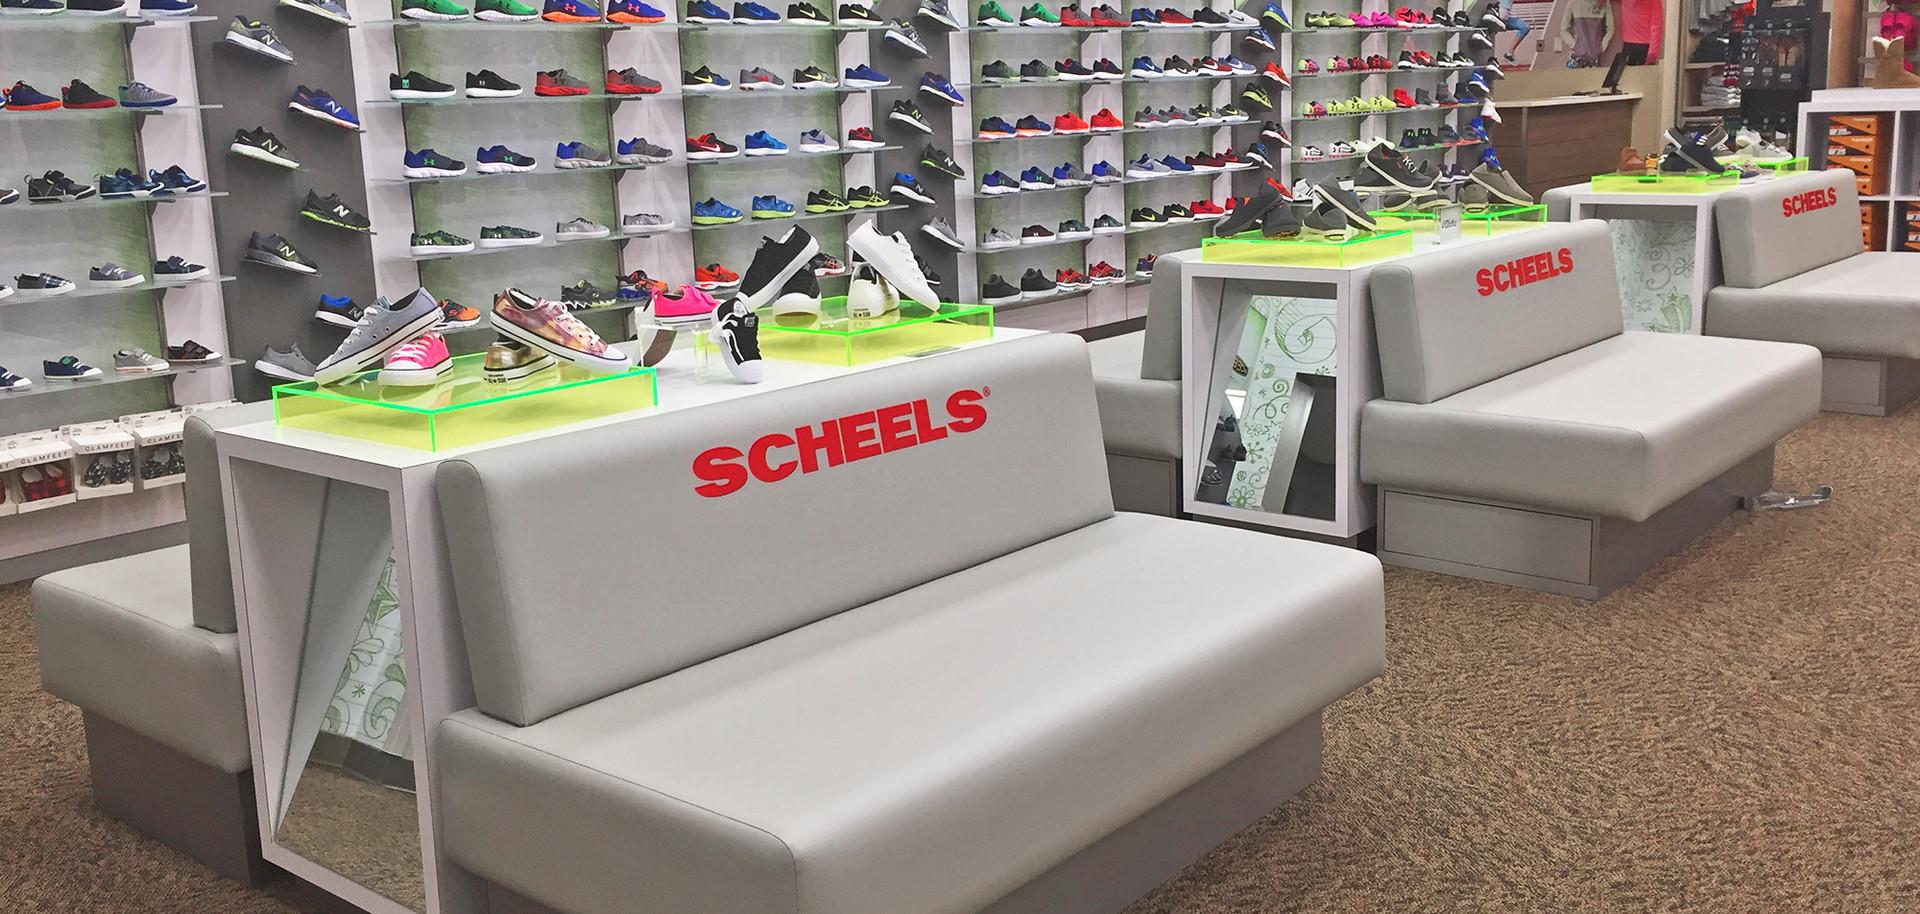 Scheels Youth Footwear